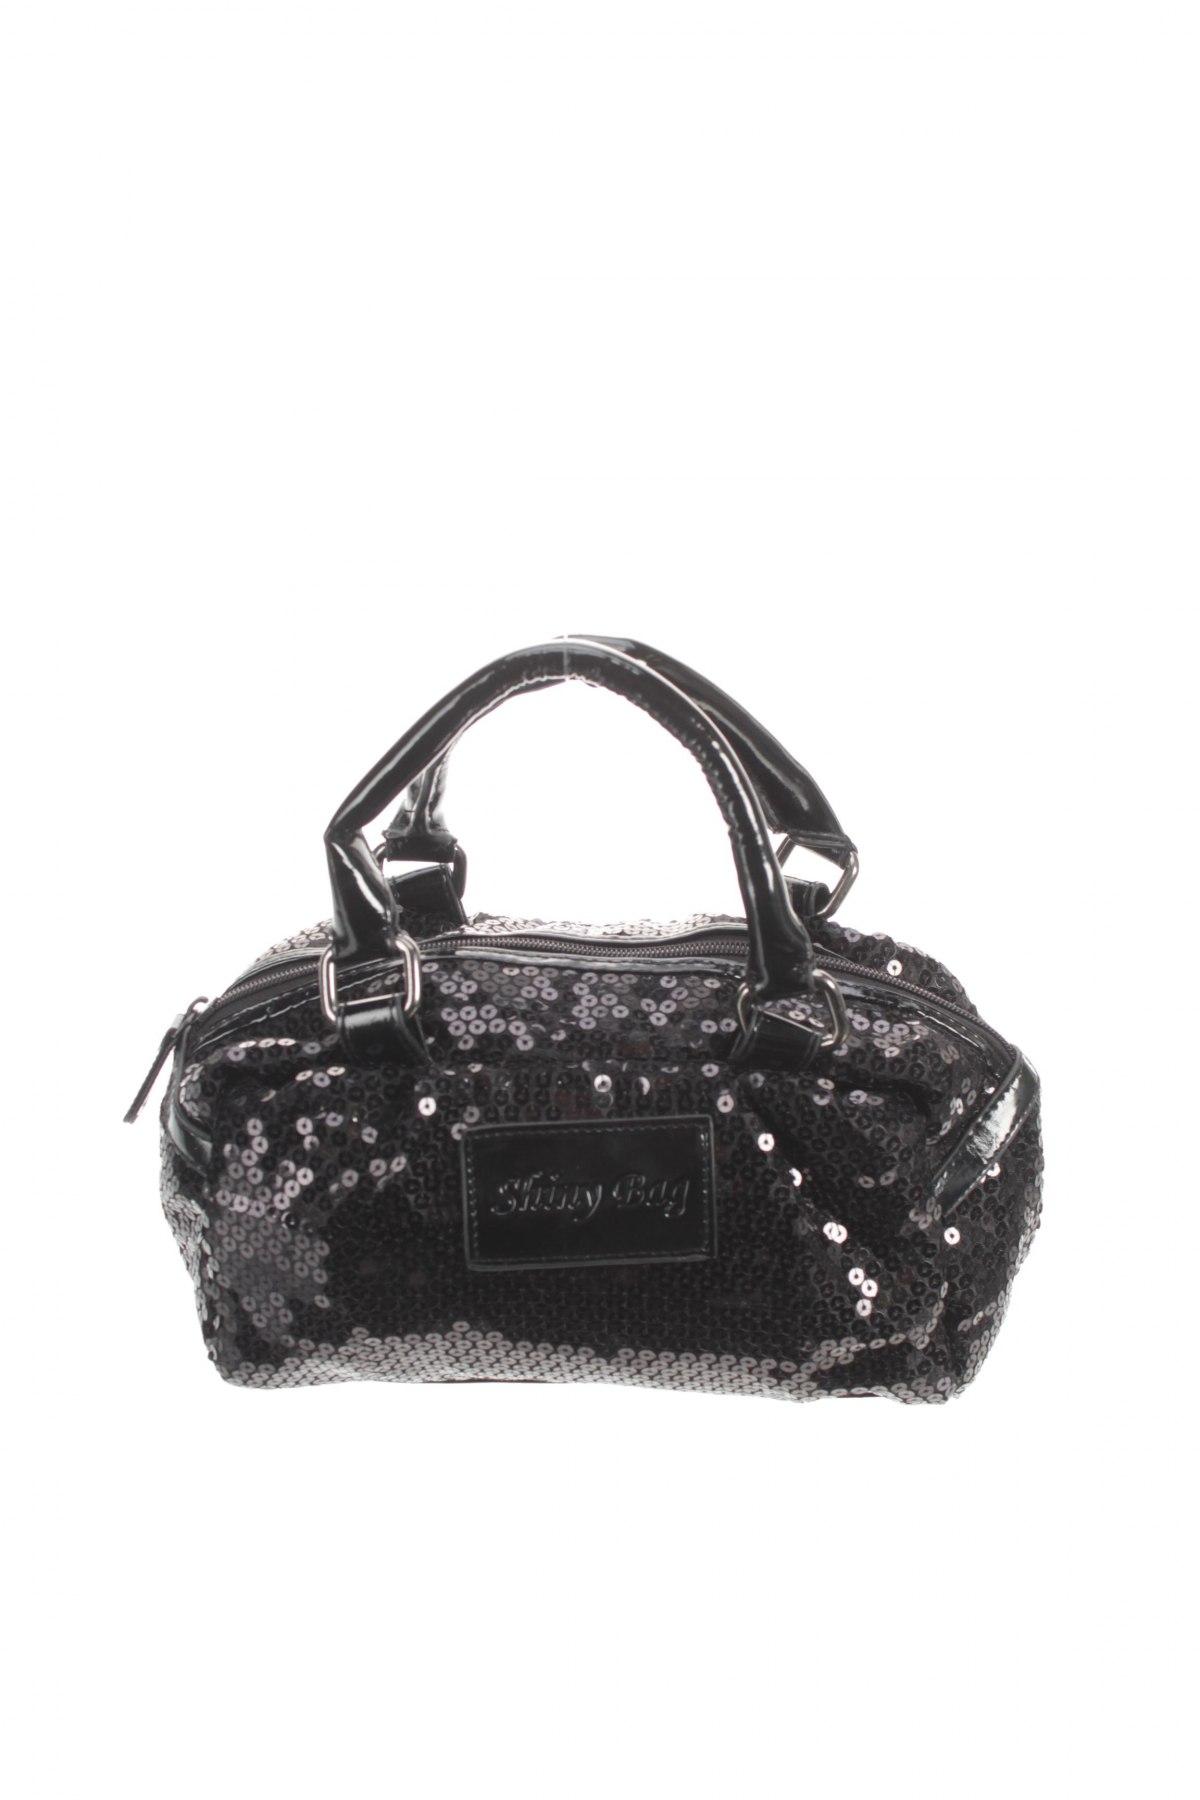 38882512dc Γυναικεία τσάντα Piazza Italia - σε συμφέρουσα τιμή στο Remix -  7529583